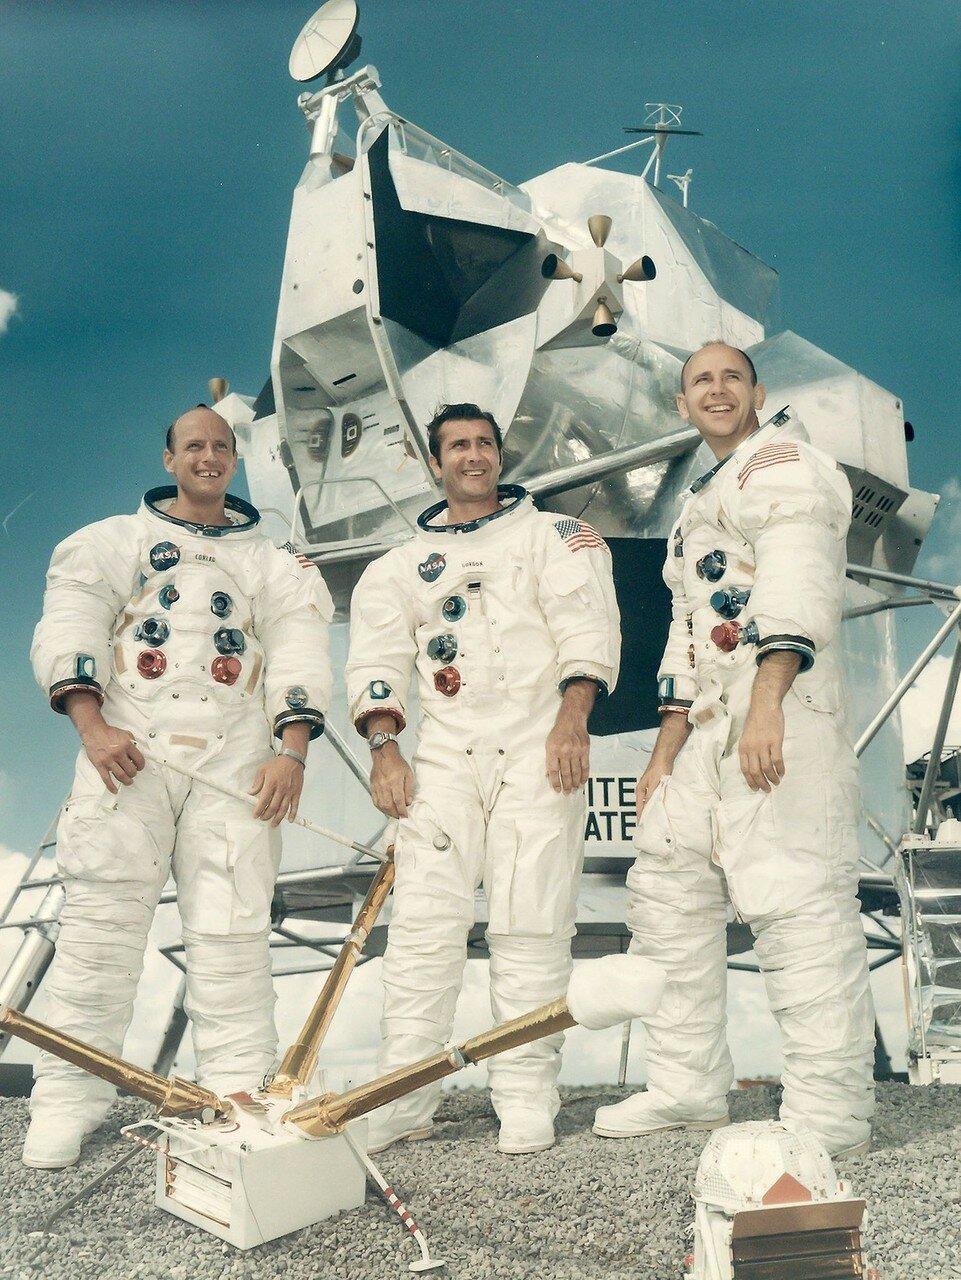 Командир — Чарльз Конрад (3-й полёт);Пилот командного модуля — Ричард Гордон (2-й полёт);Пилот лунного модуля — Алан Бин (1-й полёт)